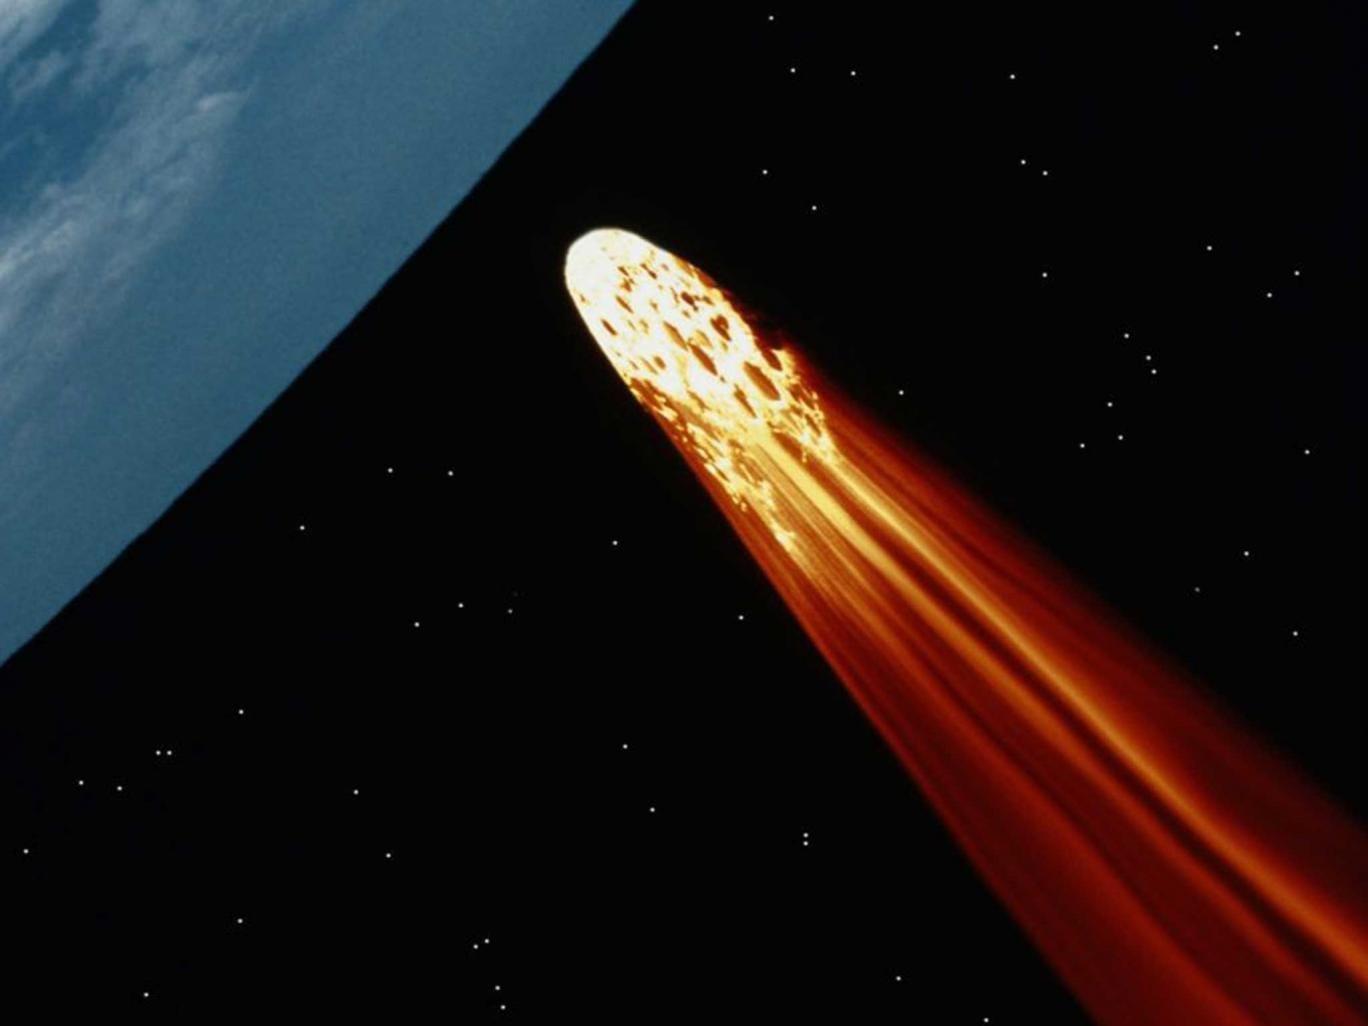 jupiter destroying asteroids - photo #28